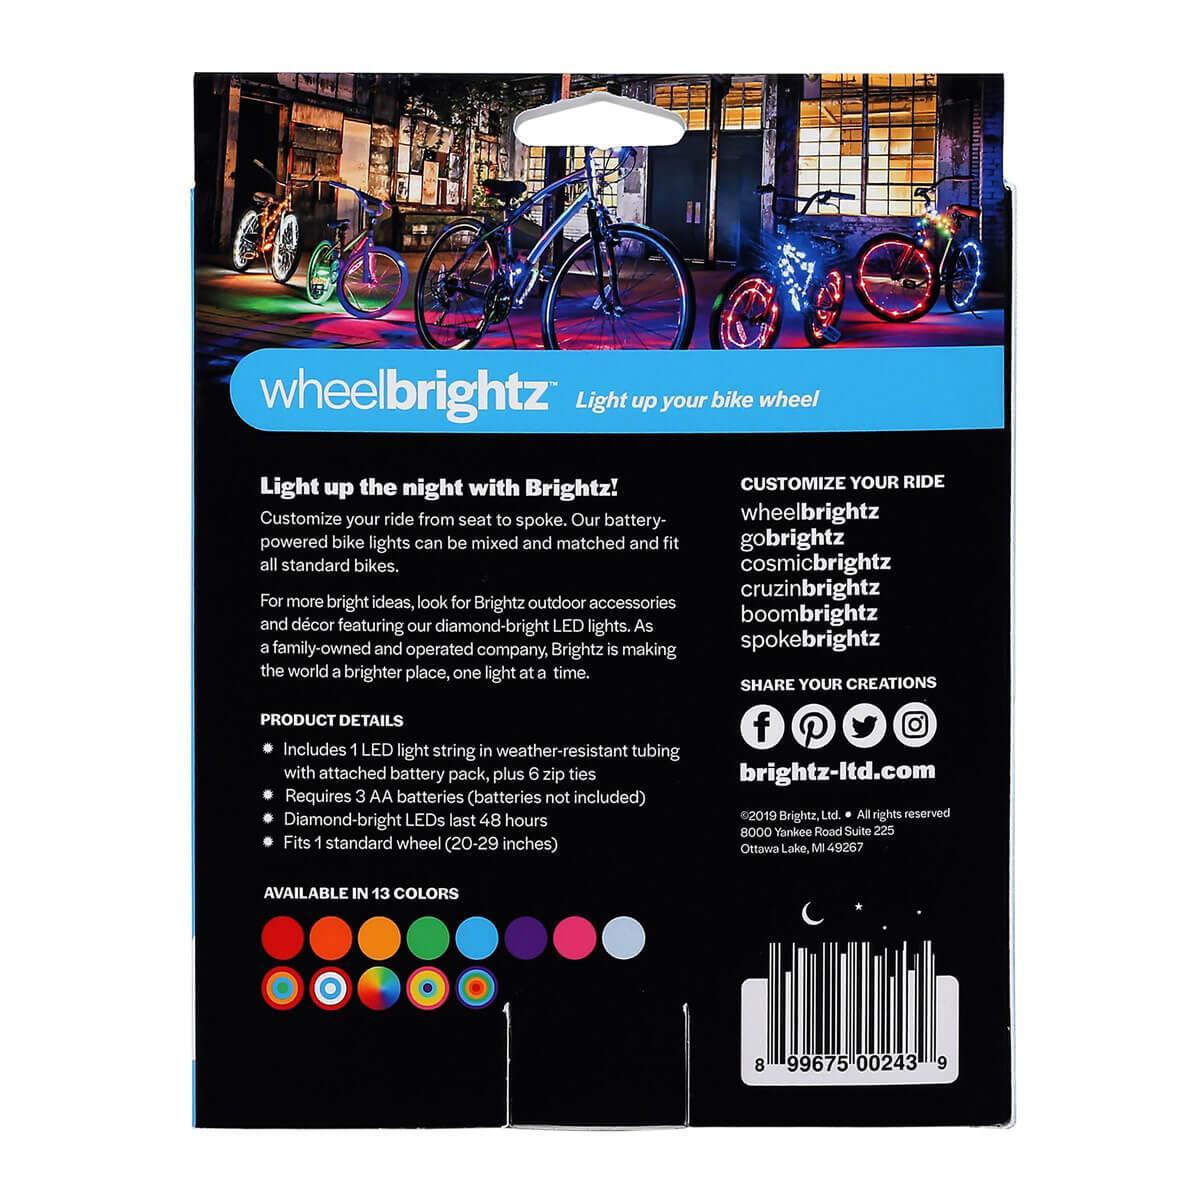 Details on bike wheel light package